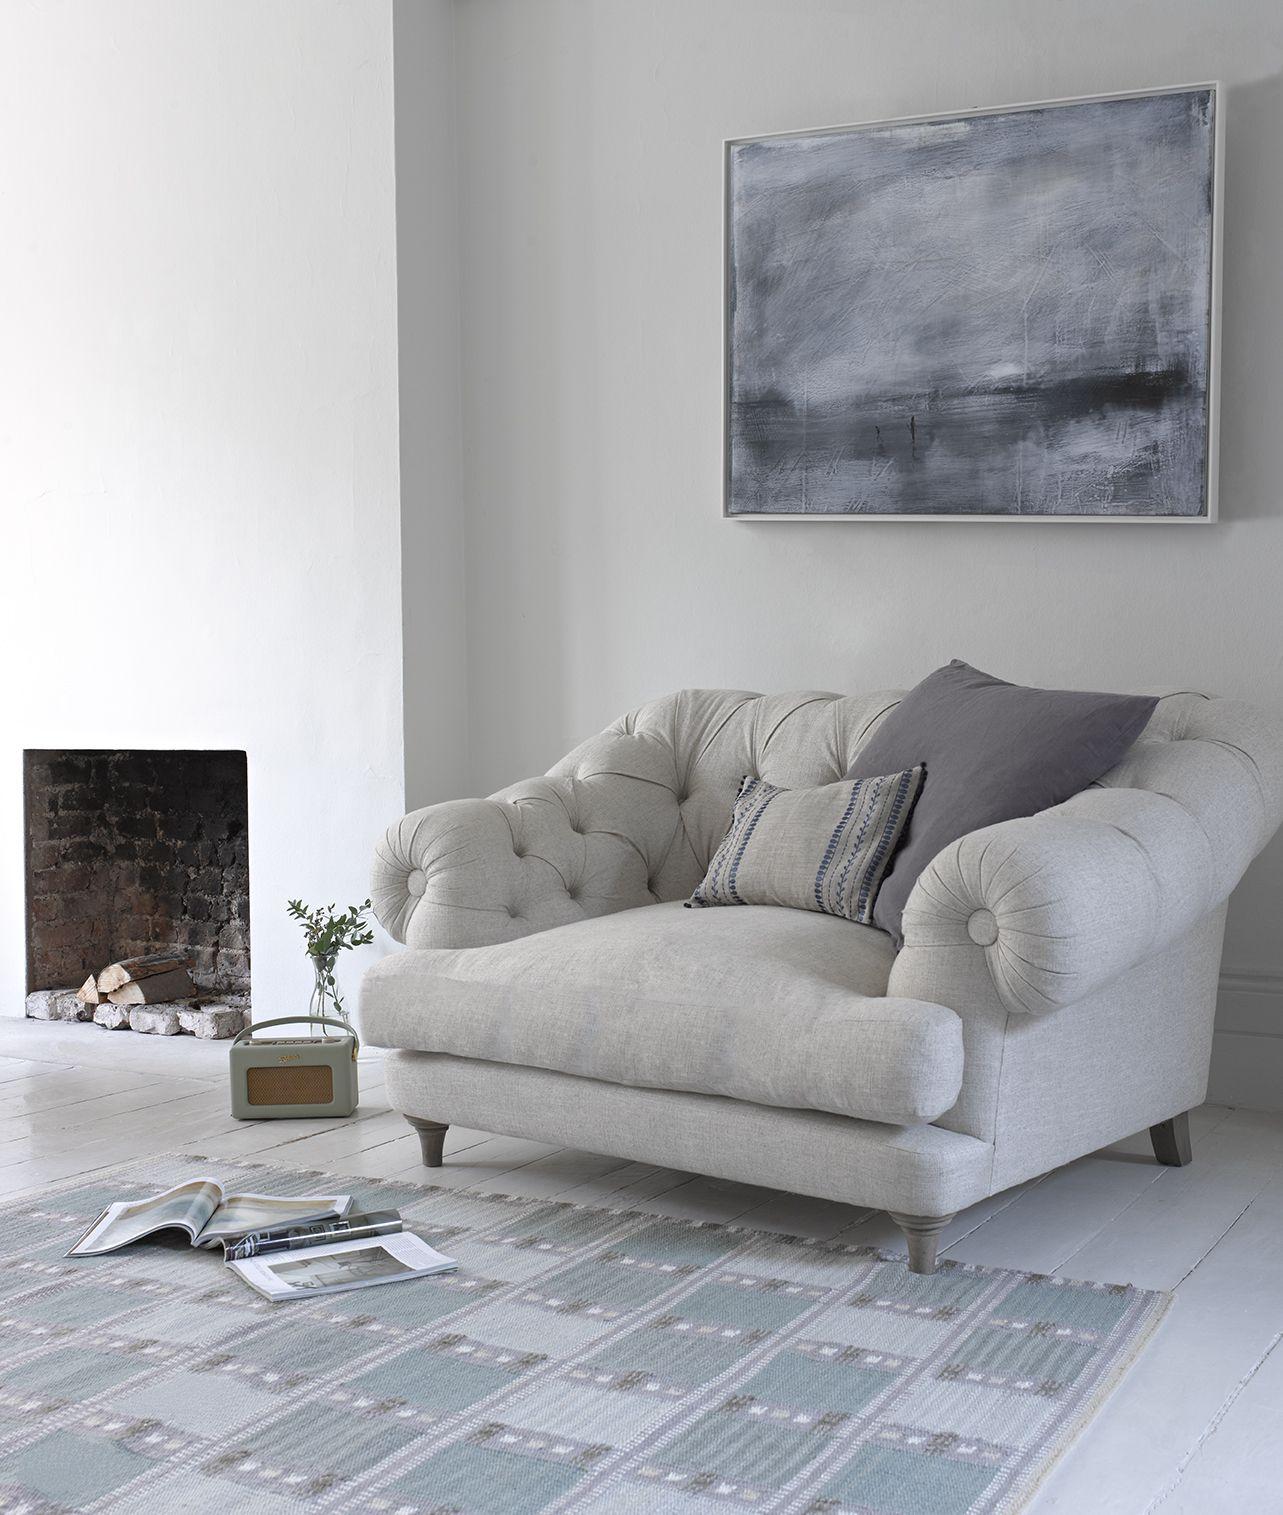 Beau Bagsie Love Seat Is Priced From £1,295, Bergen Rug £295